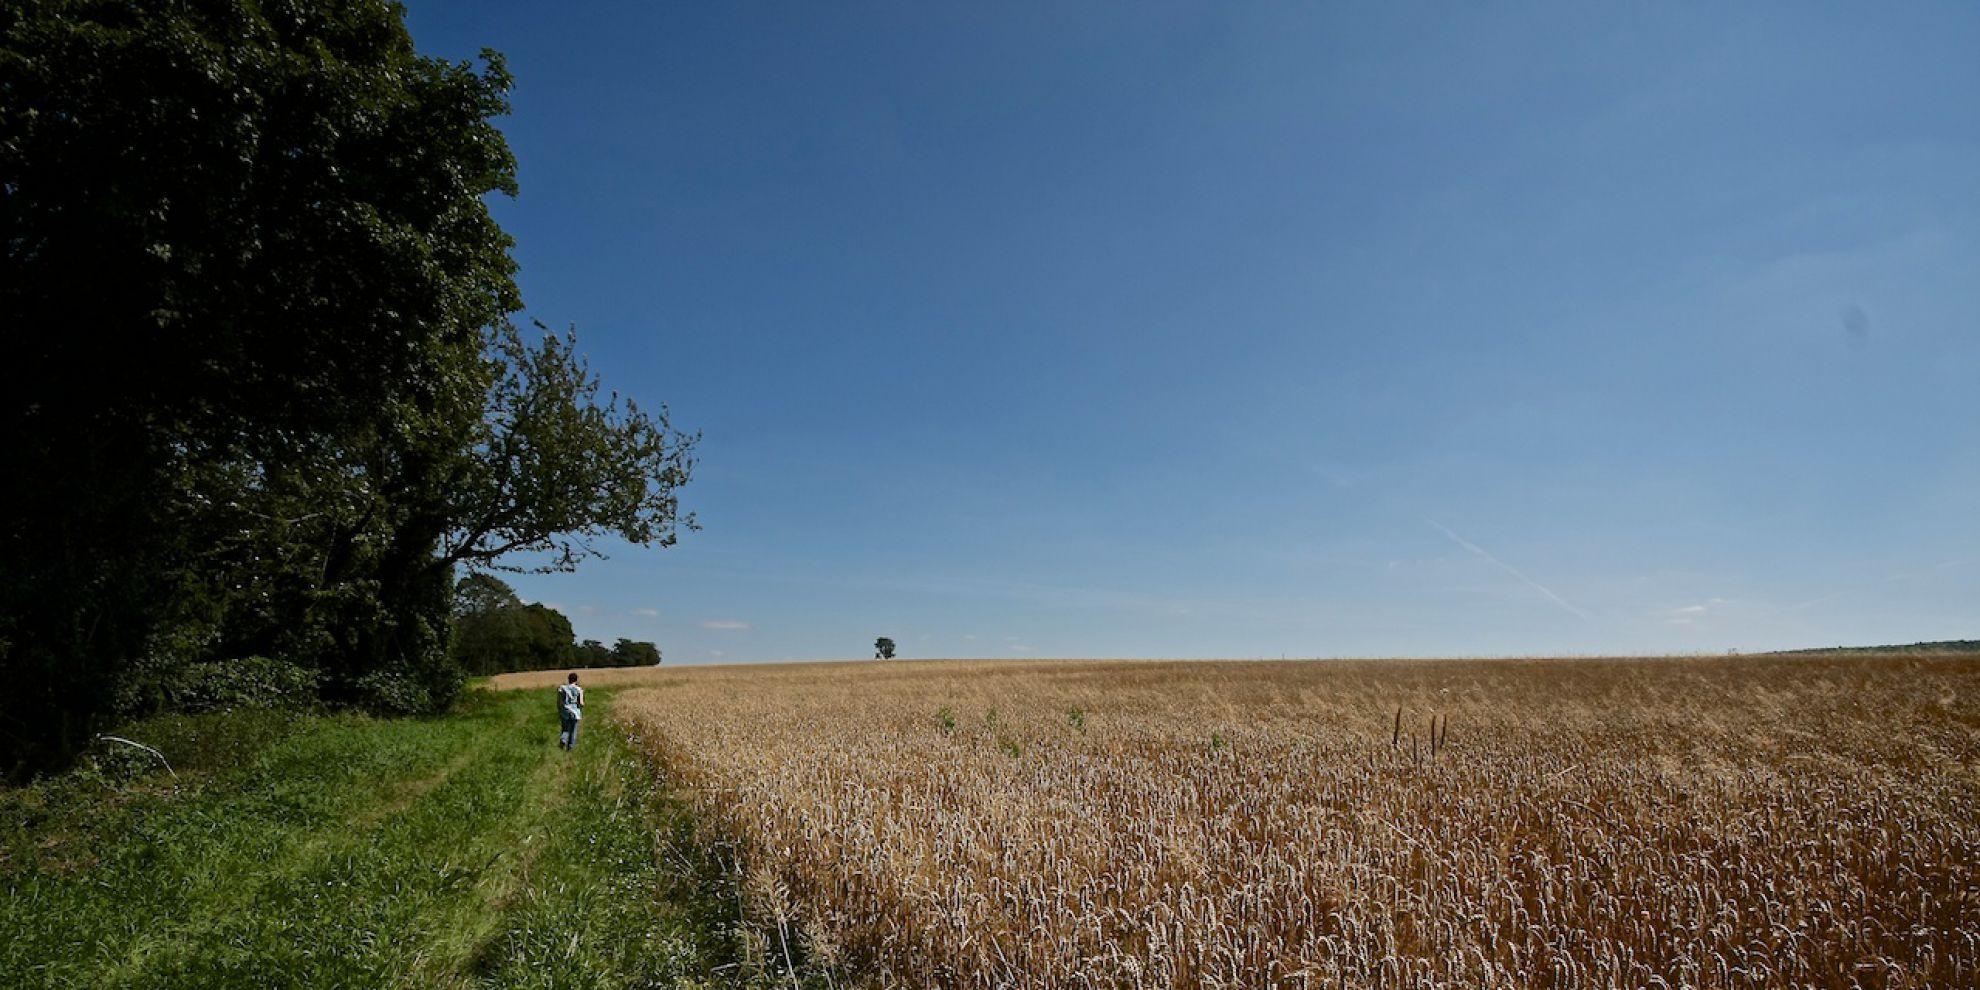 Vorbei an ruhigen Feldern